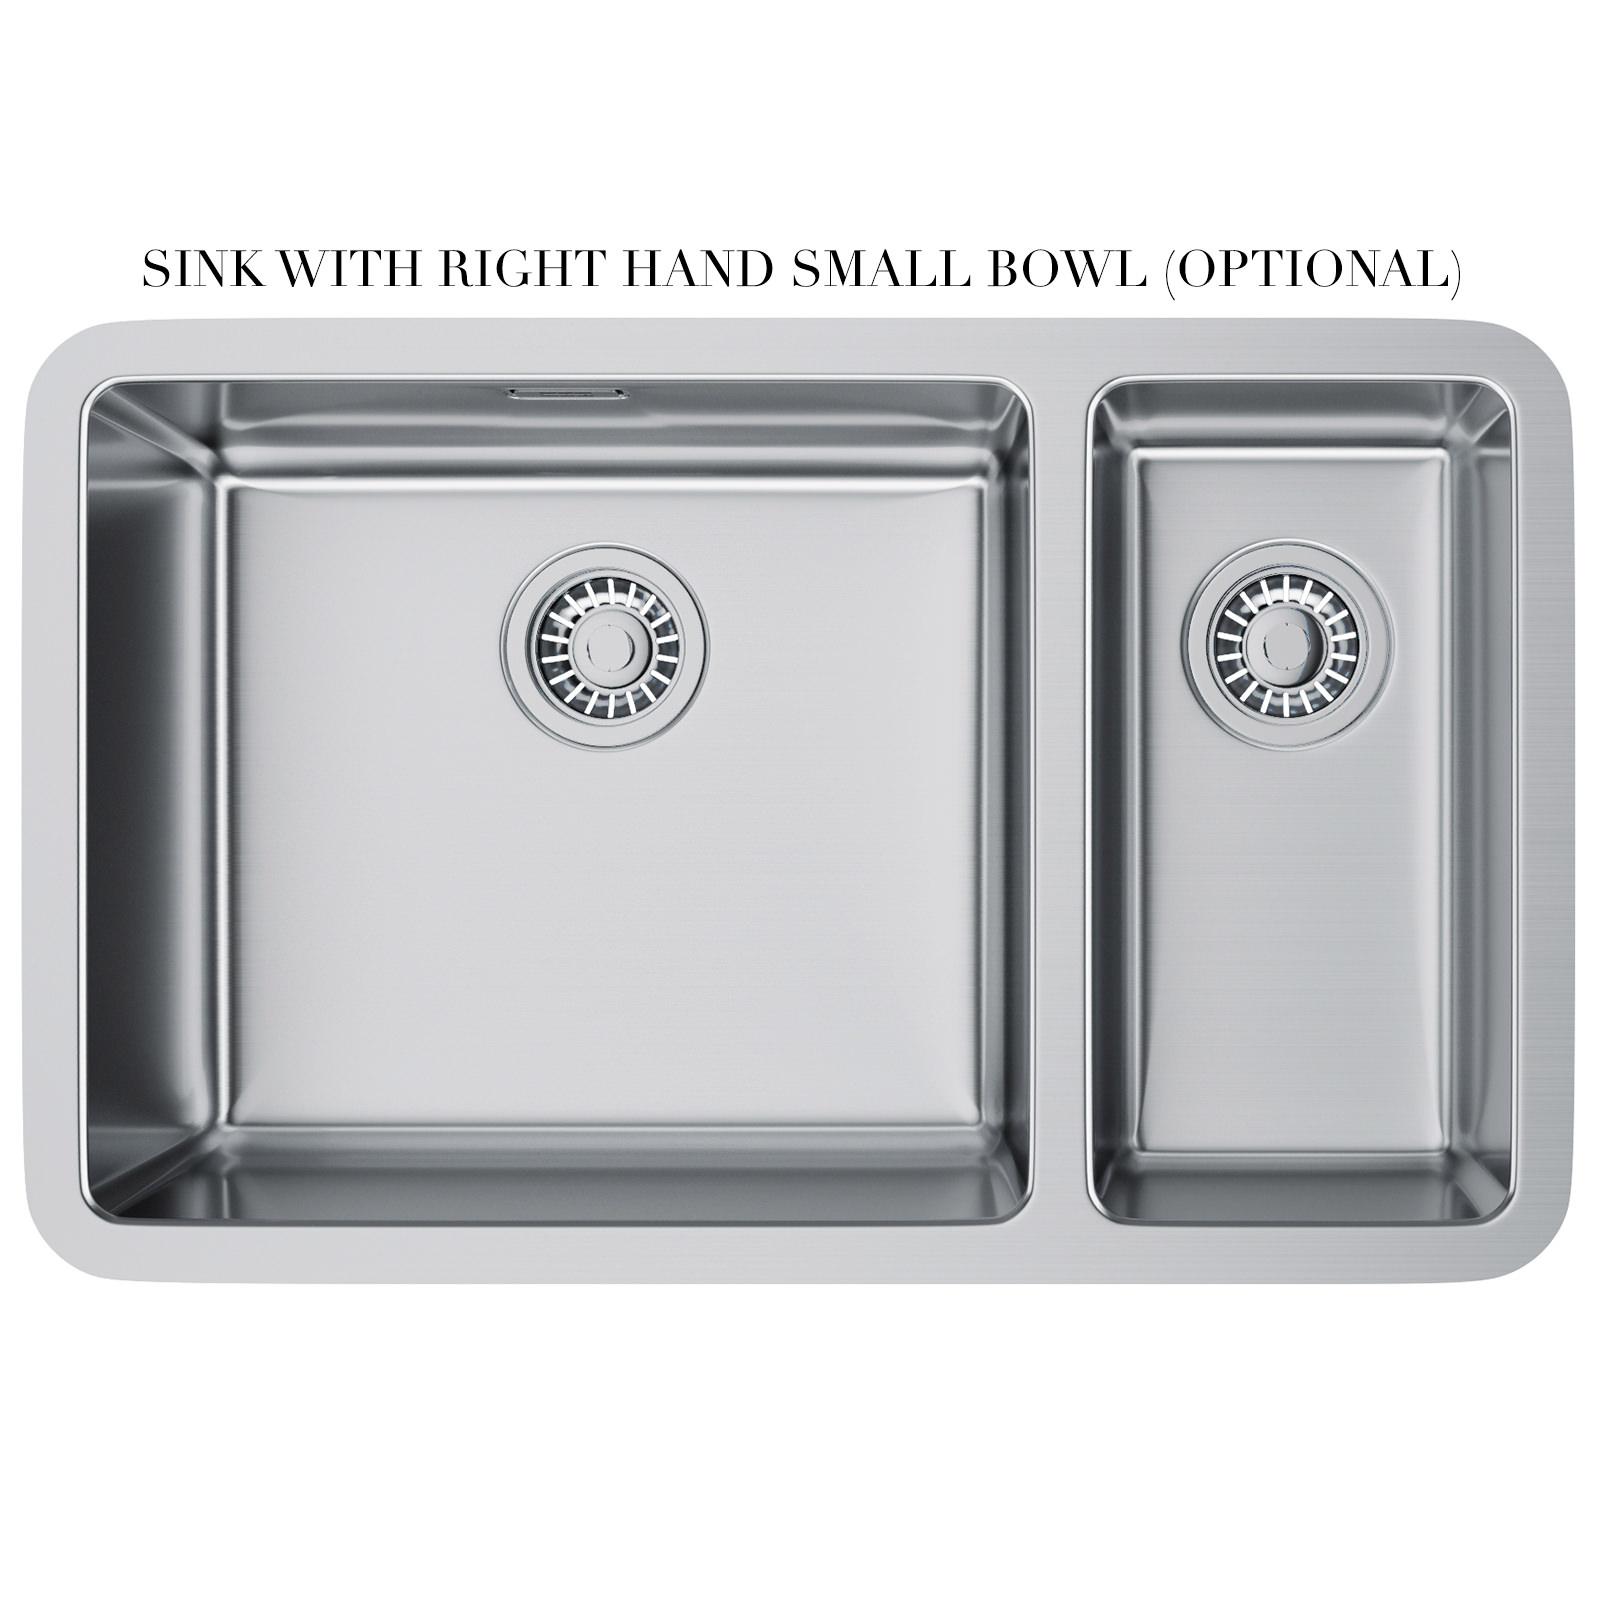 Kubus Sink Franke : ... of Franke Kubus KBX 160 45-20 Stainless Steel 1.5 Bowl Undermount Sink